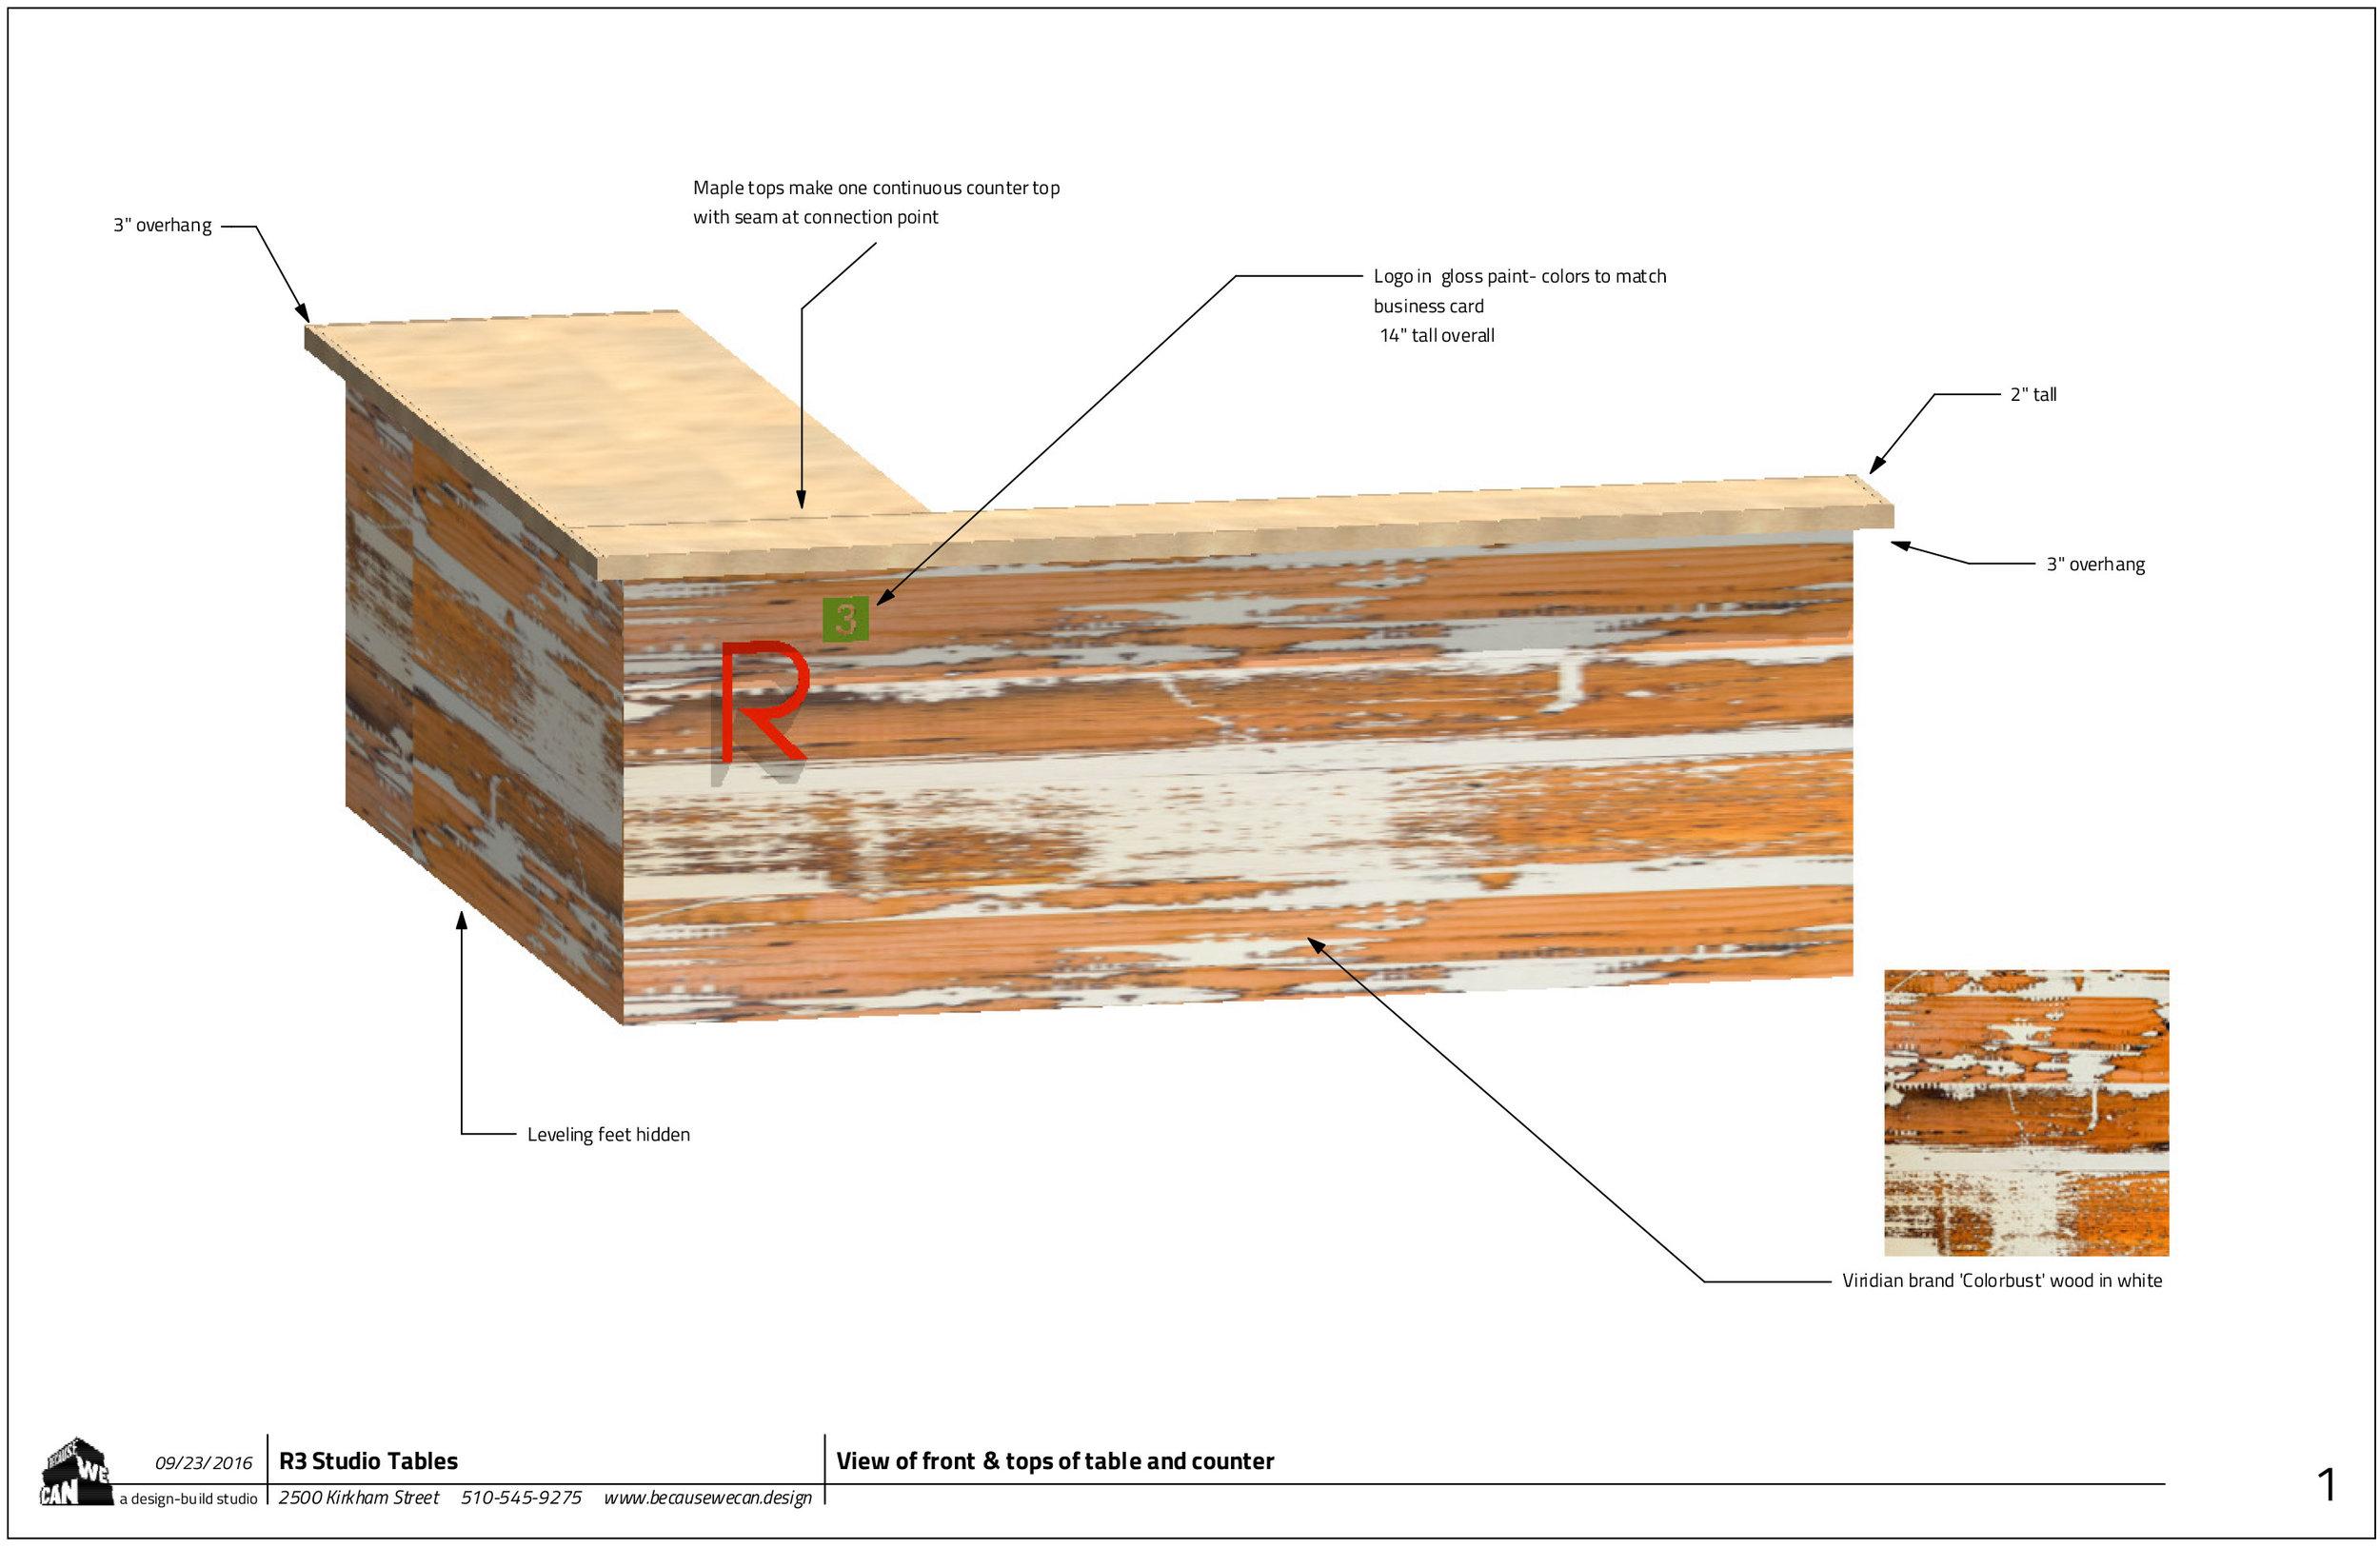 092816_R3StudioTables_Design-1-WEB.jpg